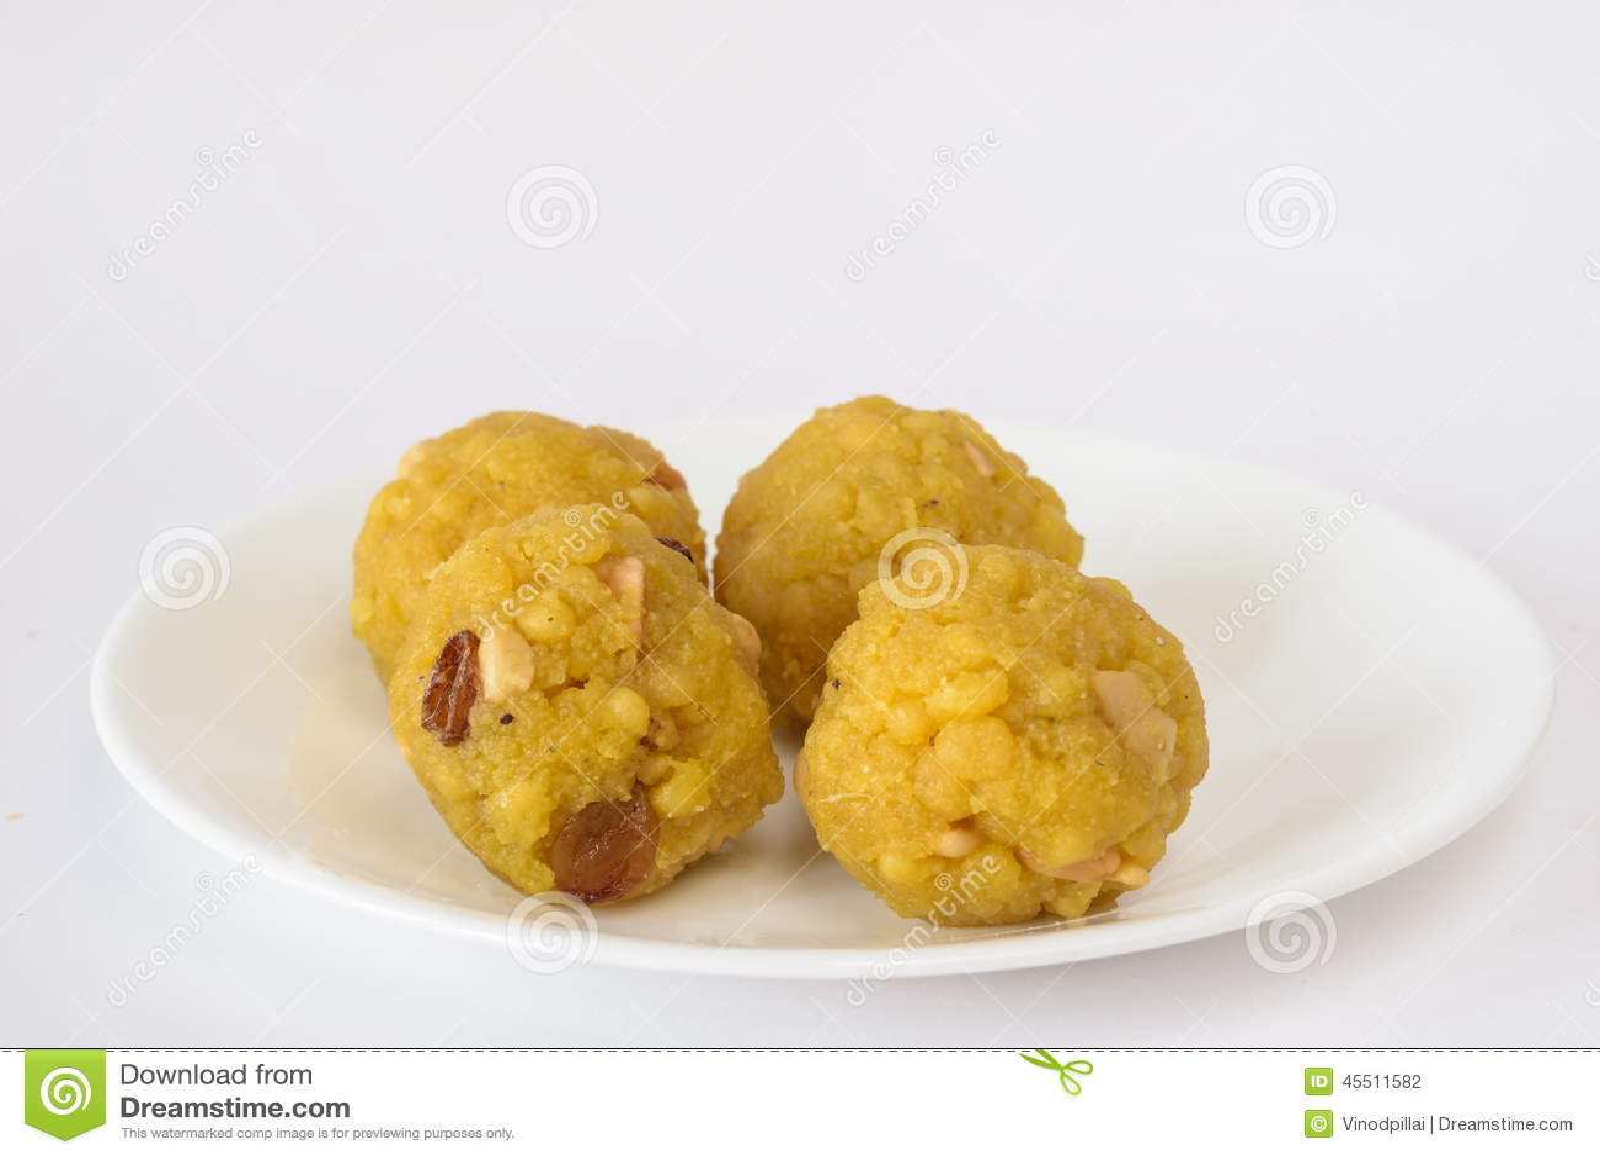 Plate with Indian sweet - Boondi Laddoo